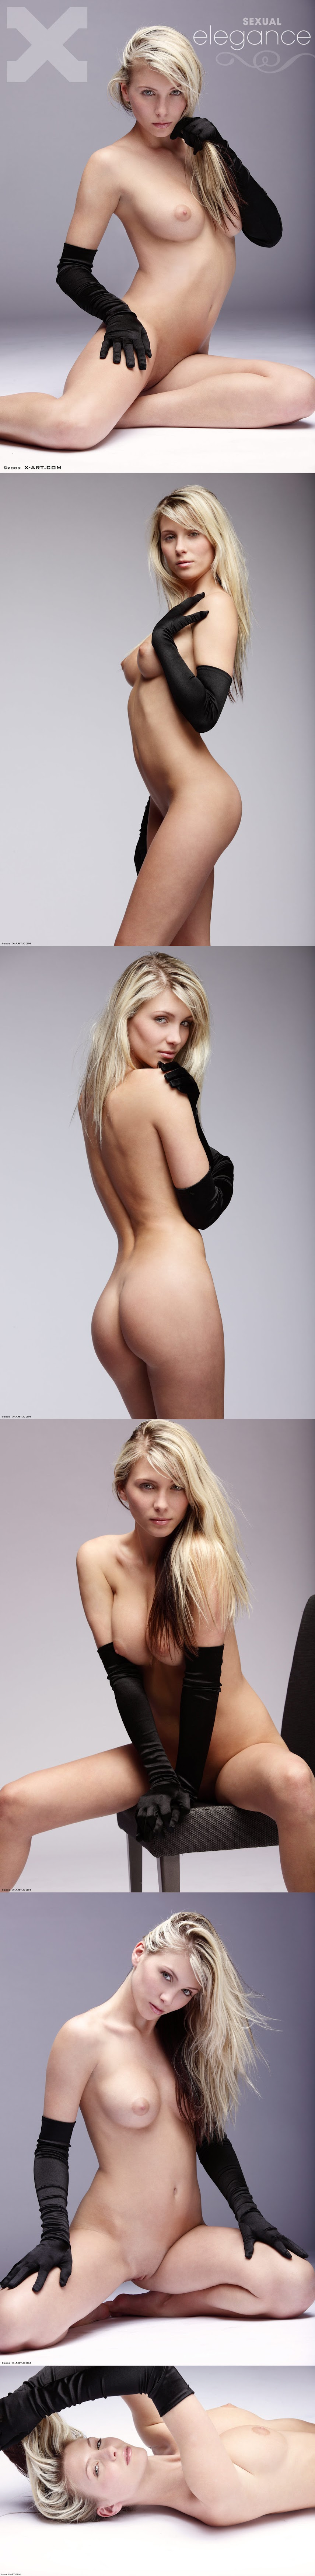 x-art nicole sexual elegance-lrg